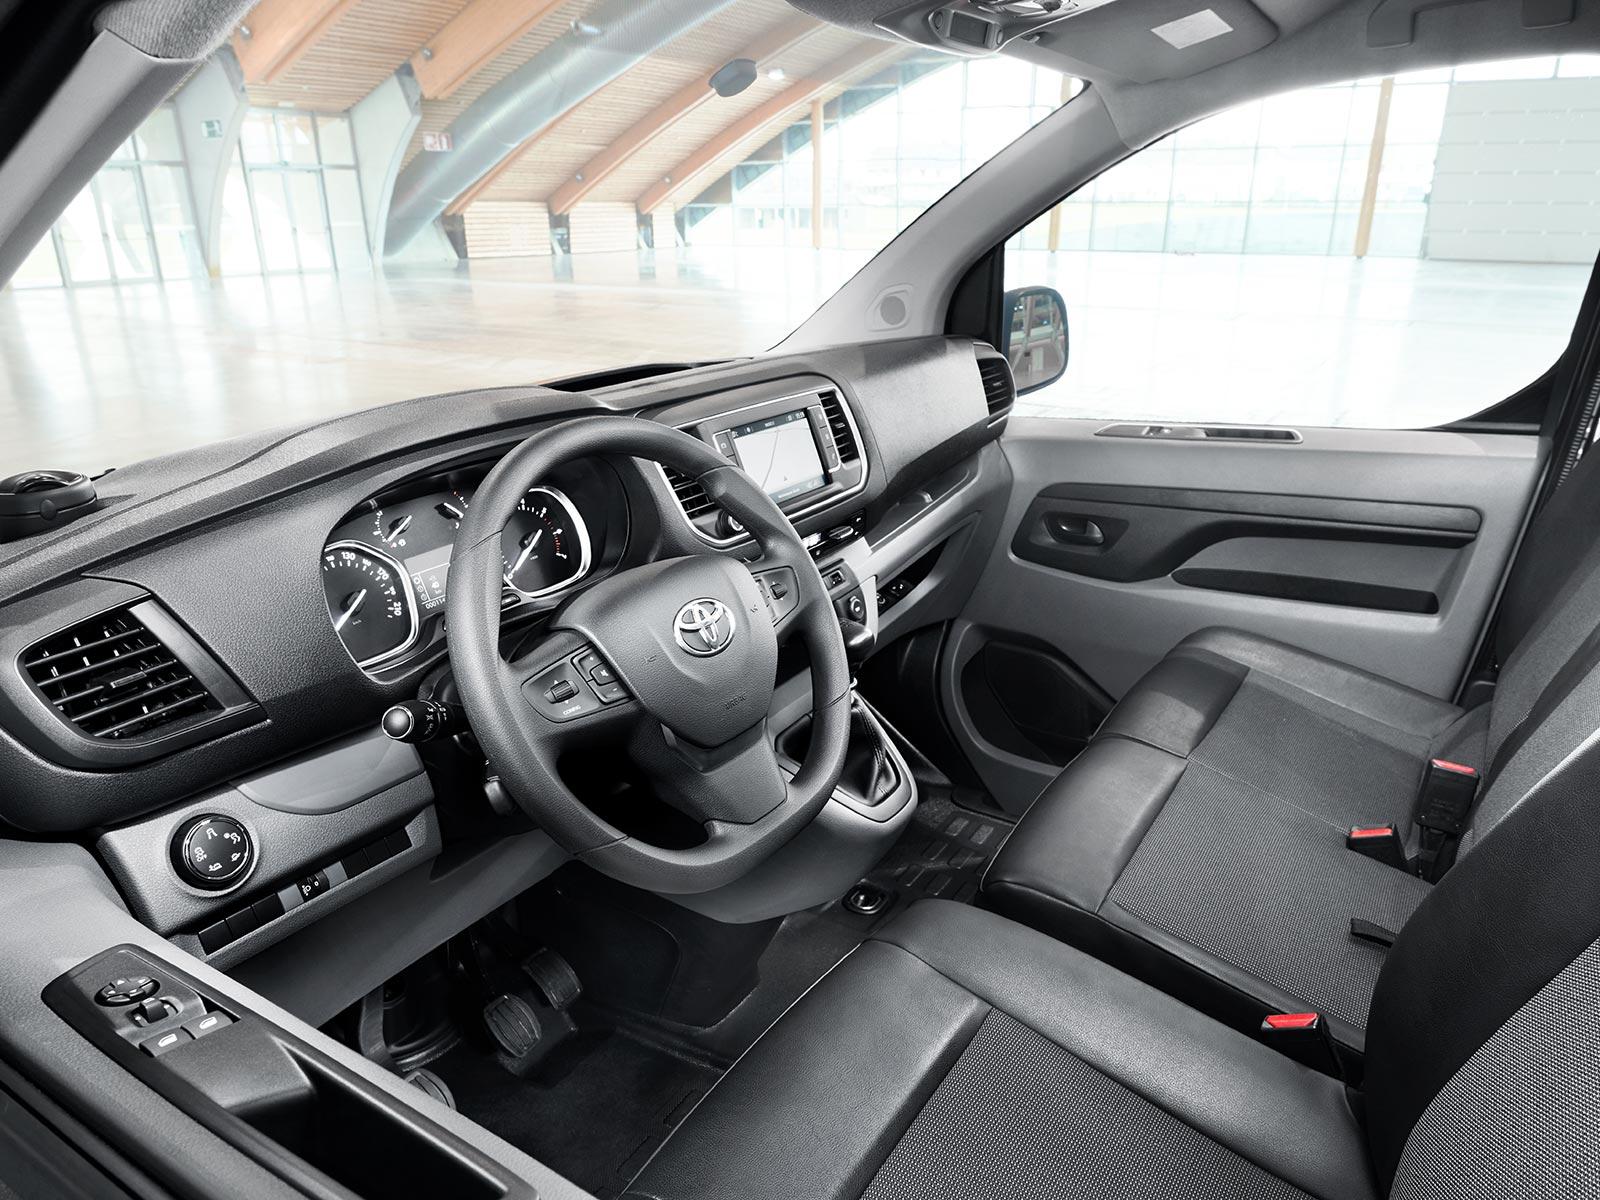 toyota-proace-van-interior-08-full_tcm-3033-1342996